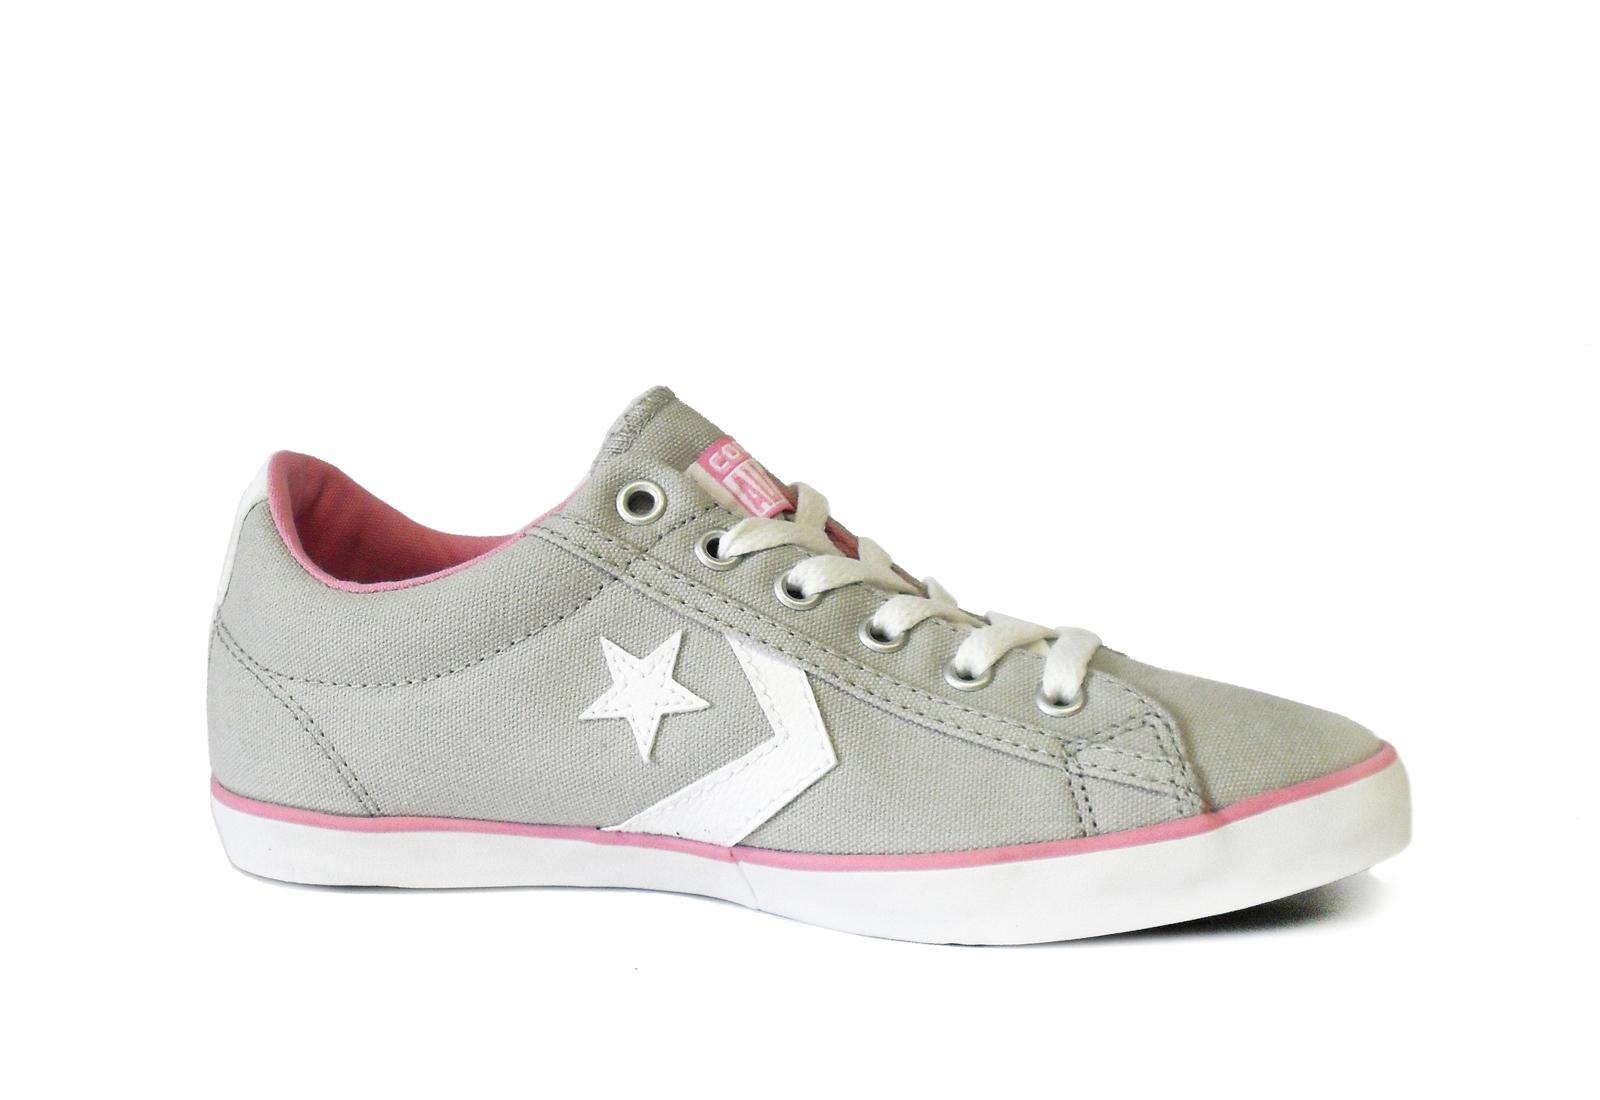 Converse Tornacipő - Star Player Lo Pro Ox - 537188C - Office Shoes ... 1af8aee3ea